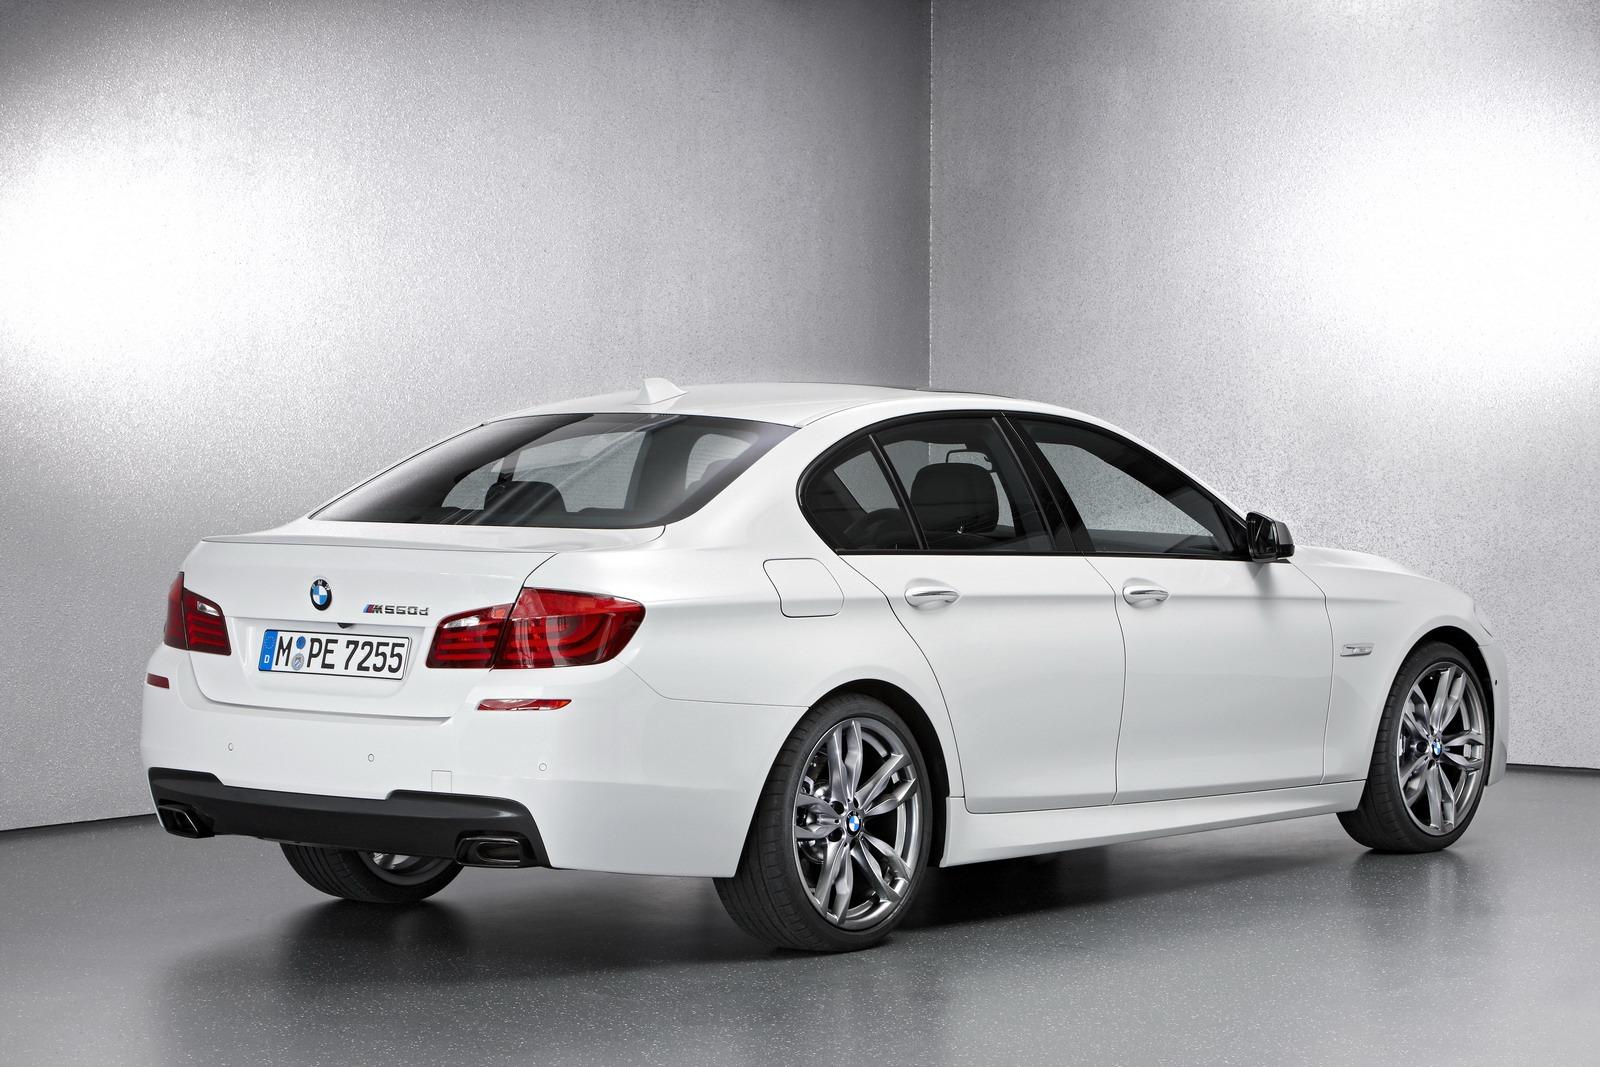 F10 BMW M550 xDrive